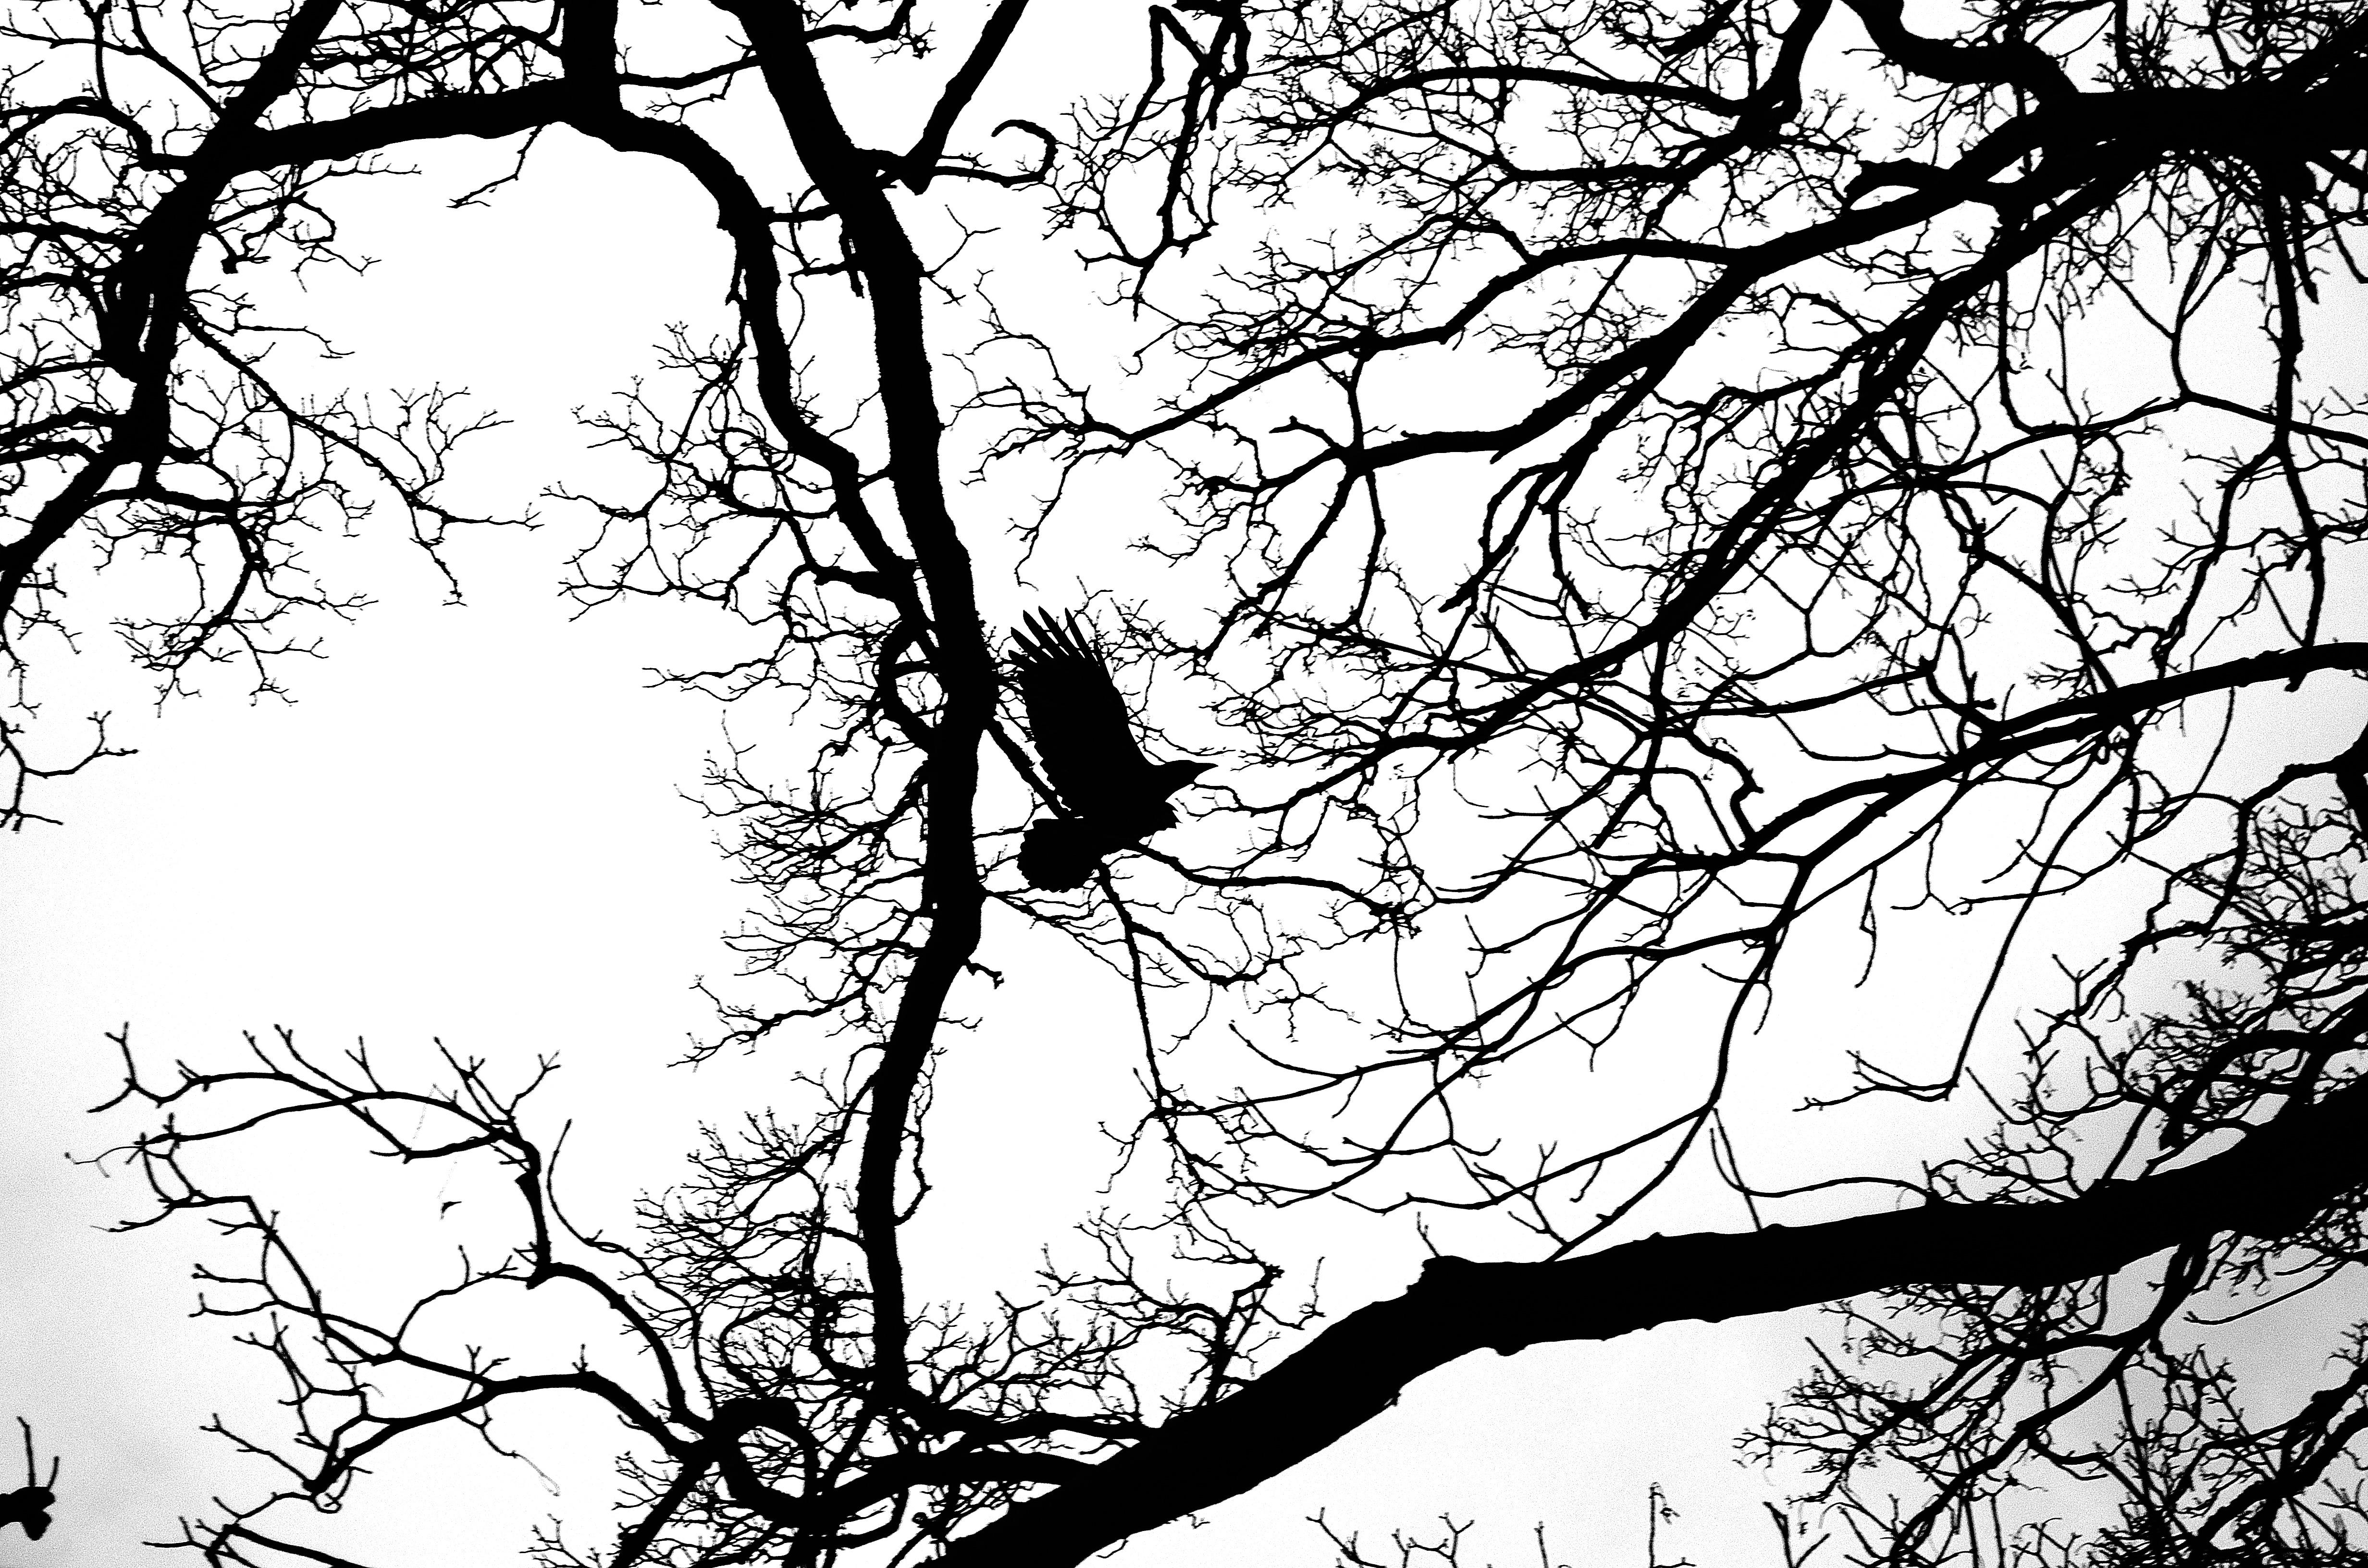 4928x3264 Free Images Tree, Nature, Branch, Silhouette, Bird, Light, Black